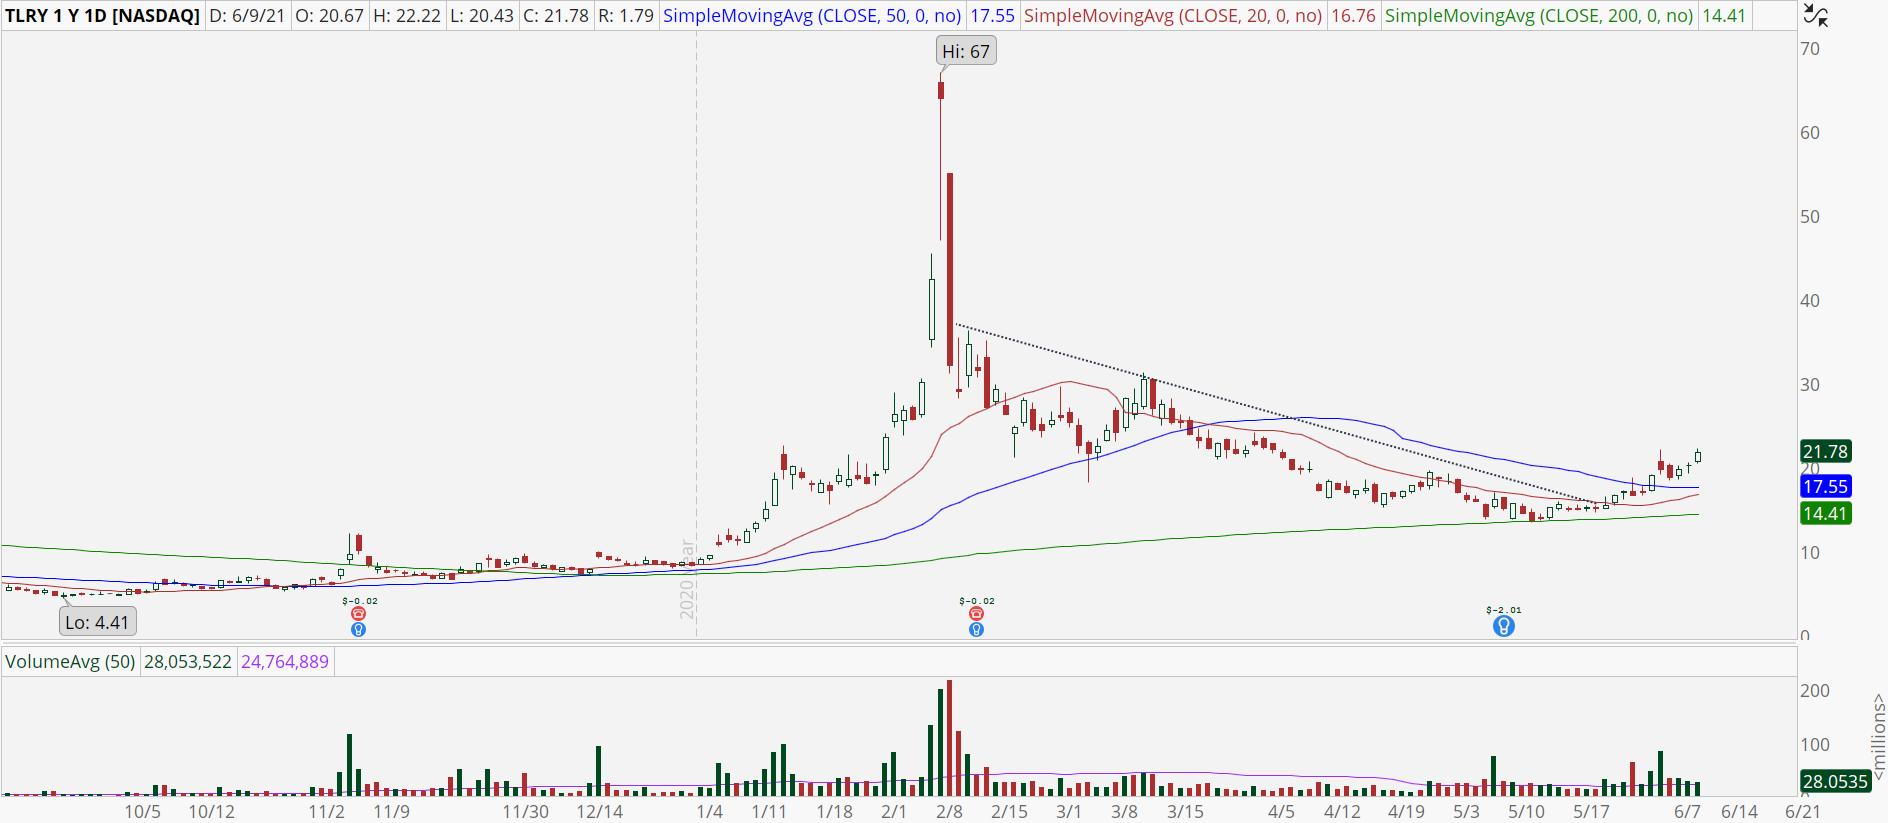 Tilray (TLRY) stock chart with bullish breakout